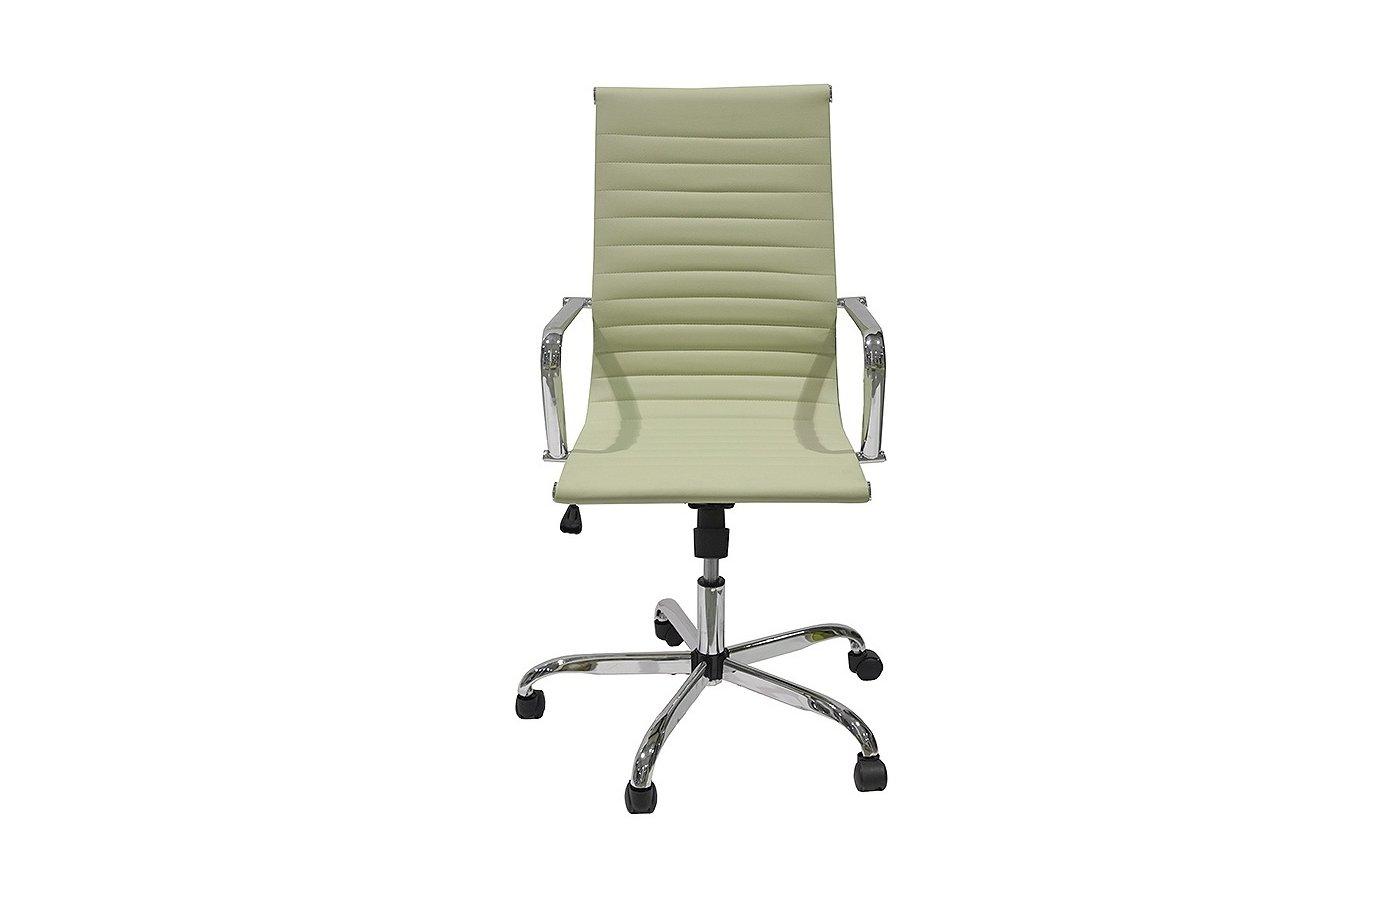 College Кресло офисное H-966L-1, бежевый, кожа, 120 кг, подлокотники кожа/хром, крестовина хром, (Шx